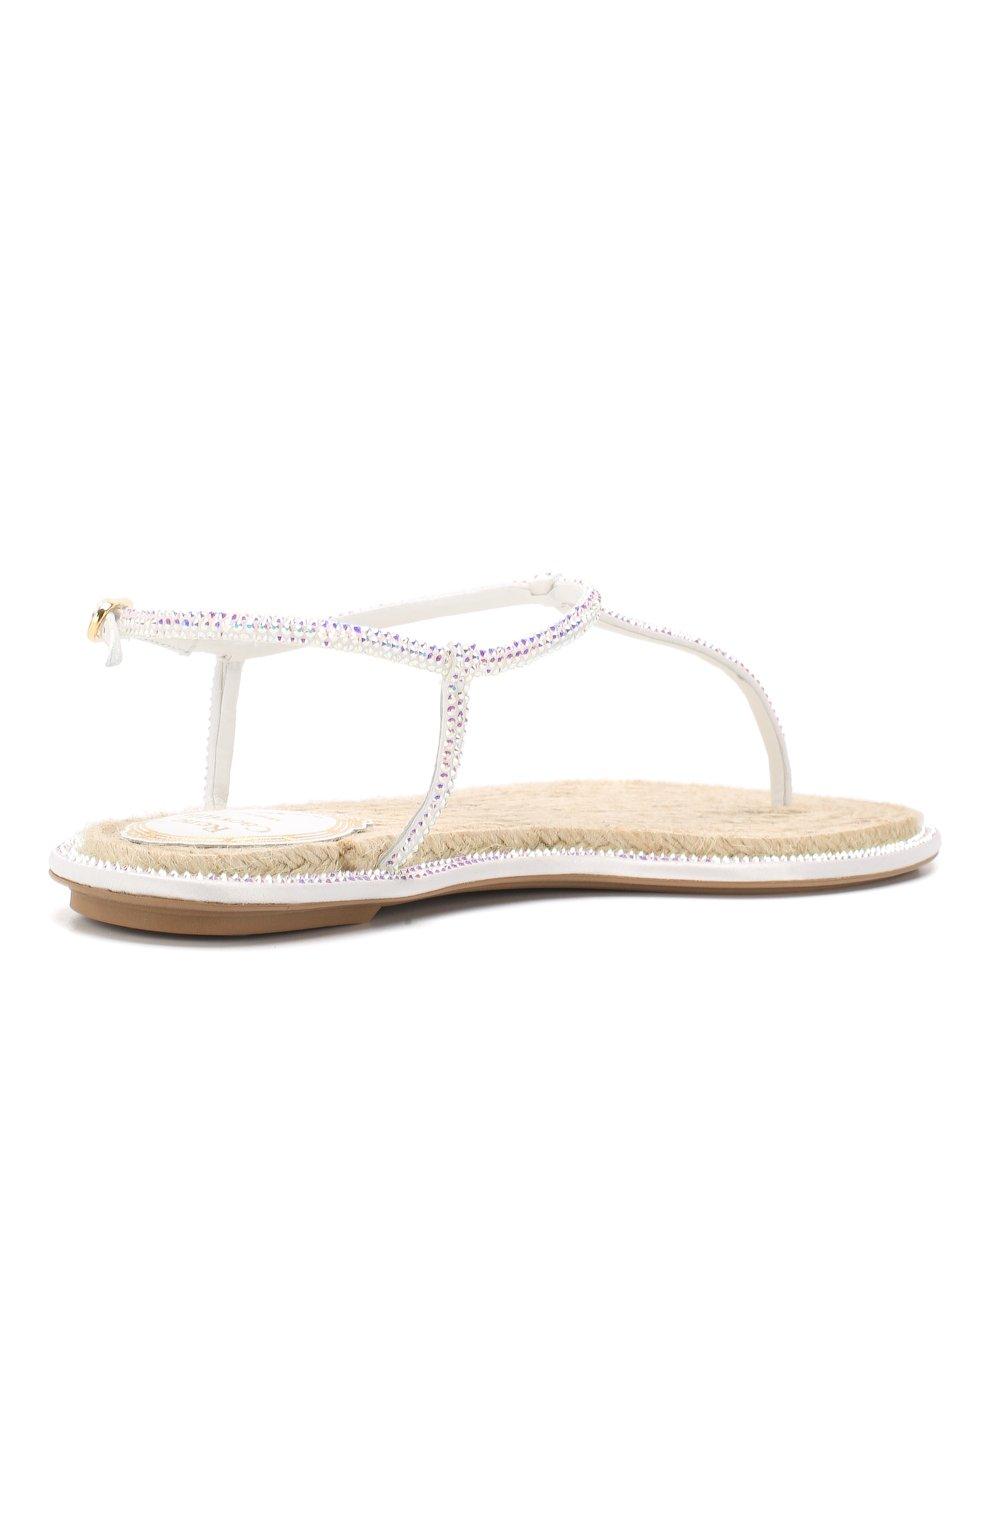 Кожаные сандалии Diana Rene Caovilla белые | Фото №4